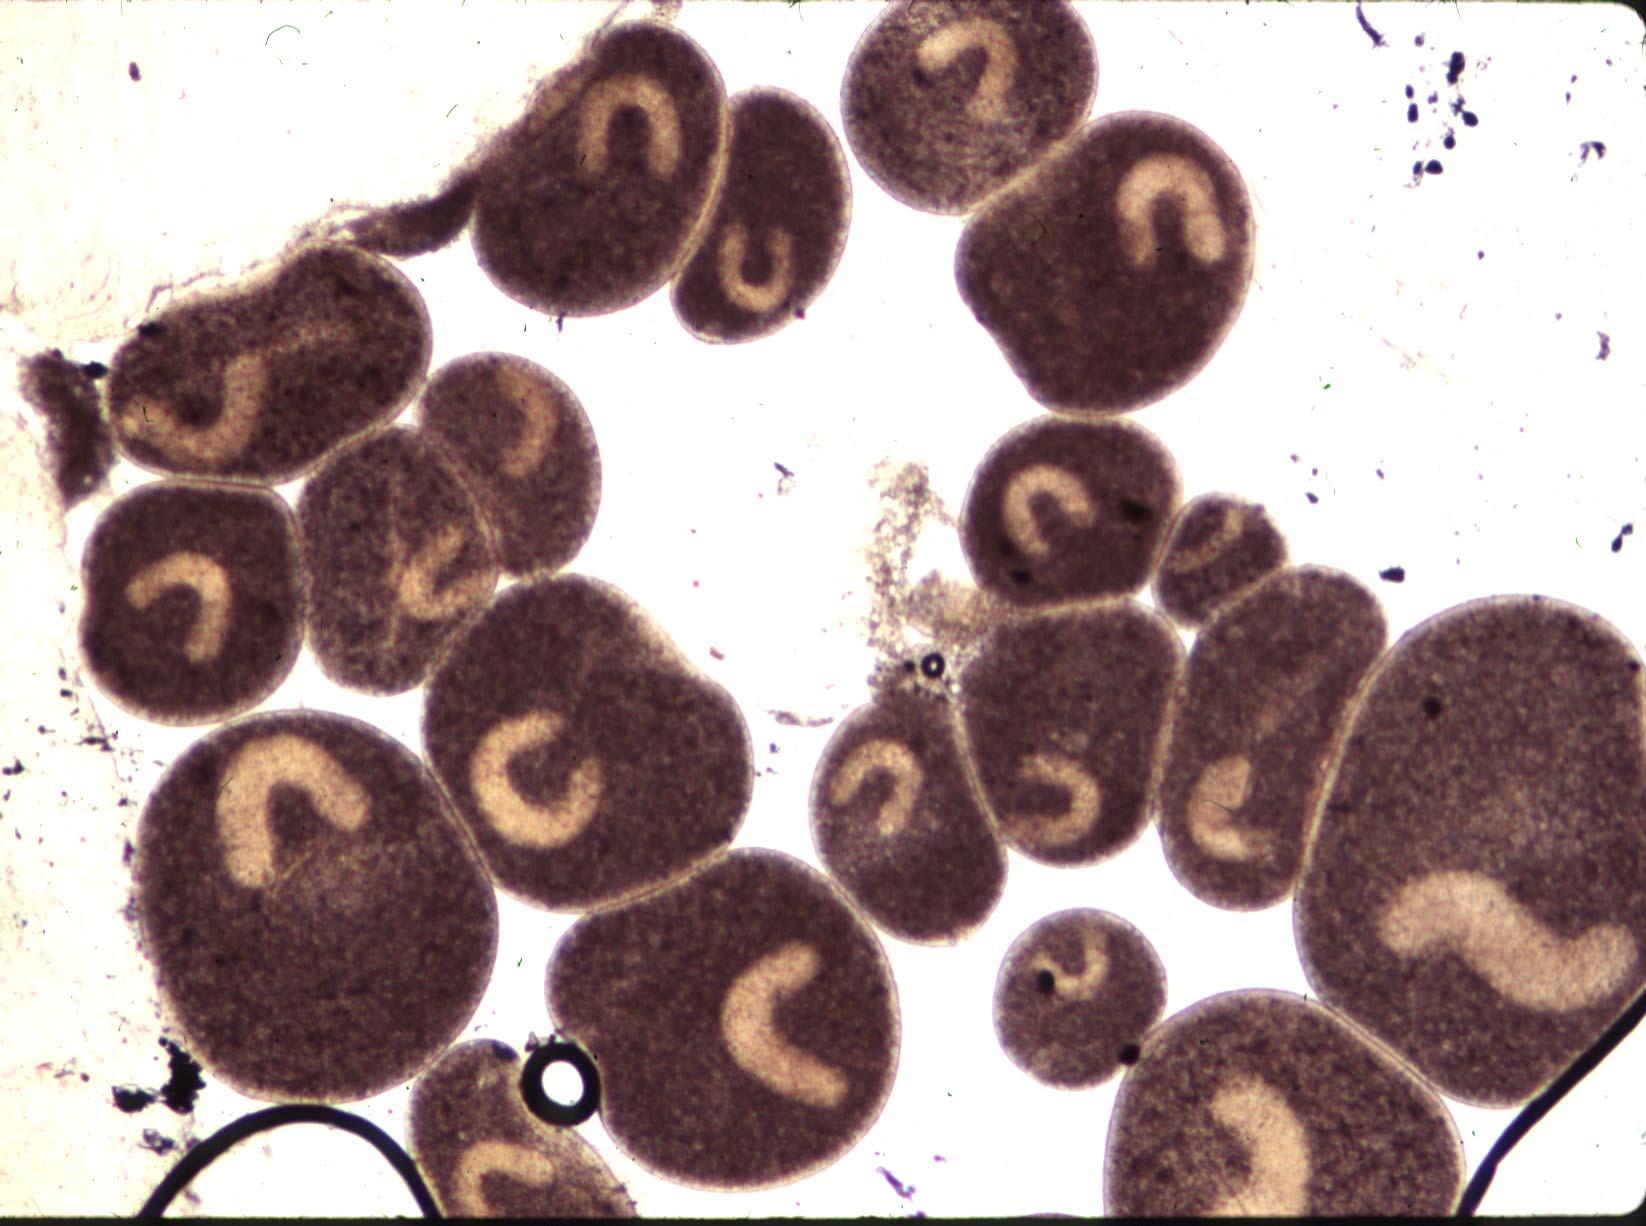 Ichthyophthirius multifiliis.jpg